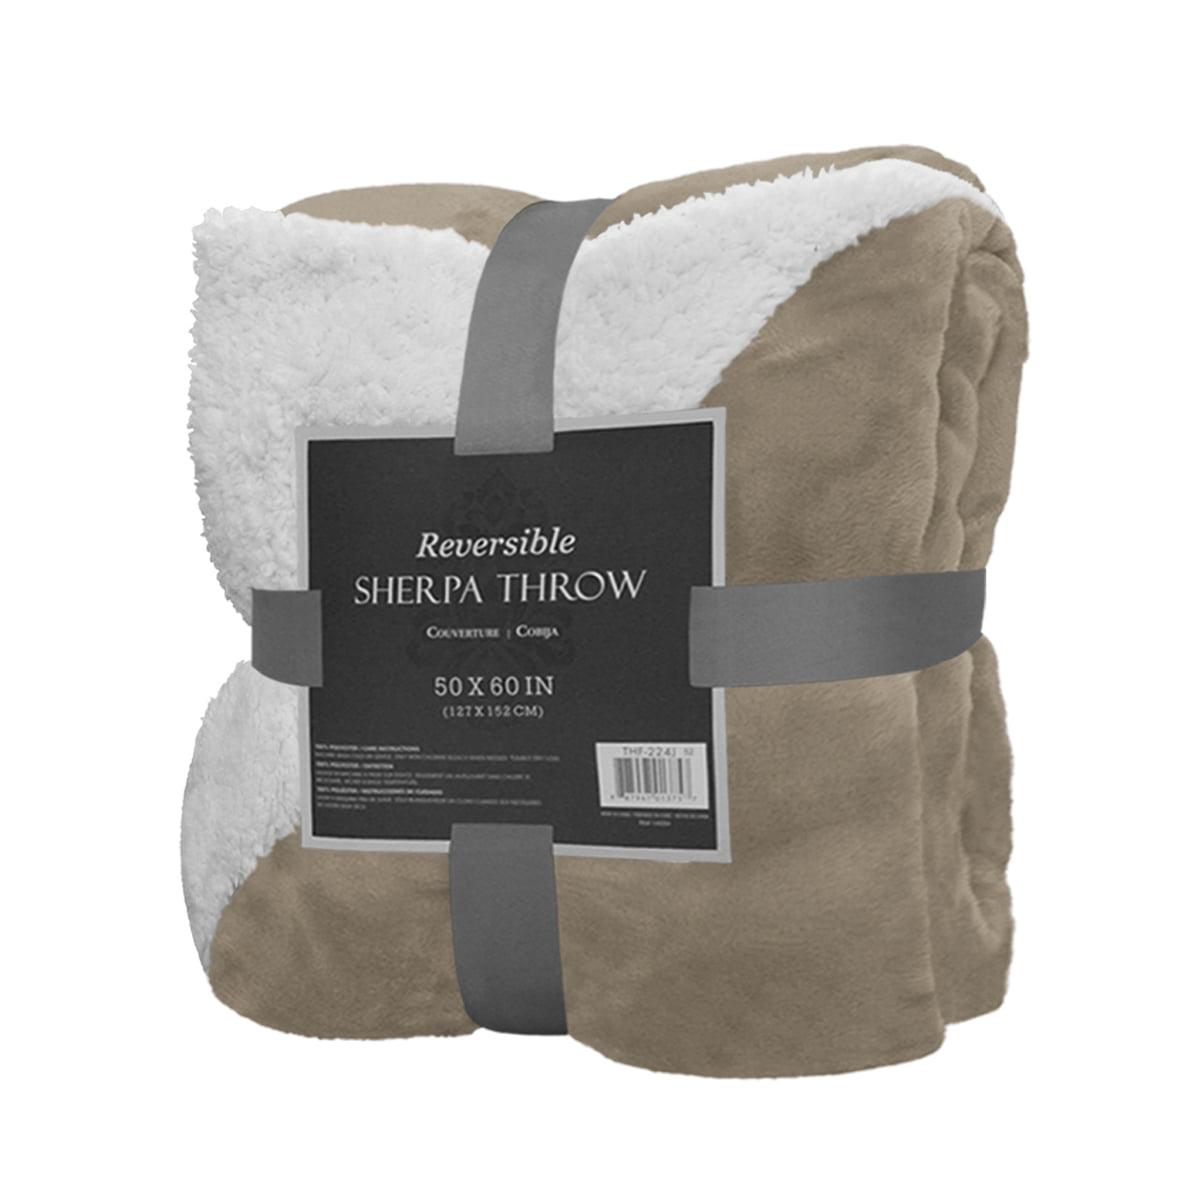 sherpa throw blanket Reversible Sherpa Throw Blanket 50